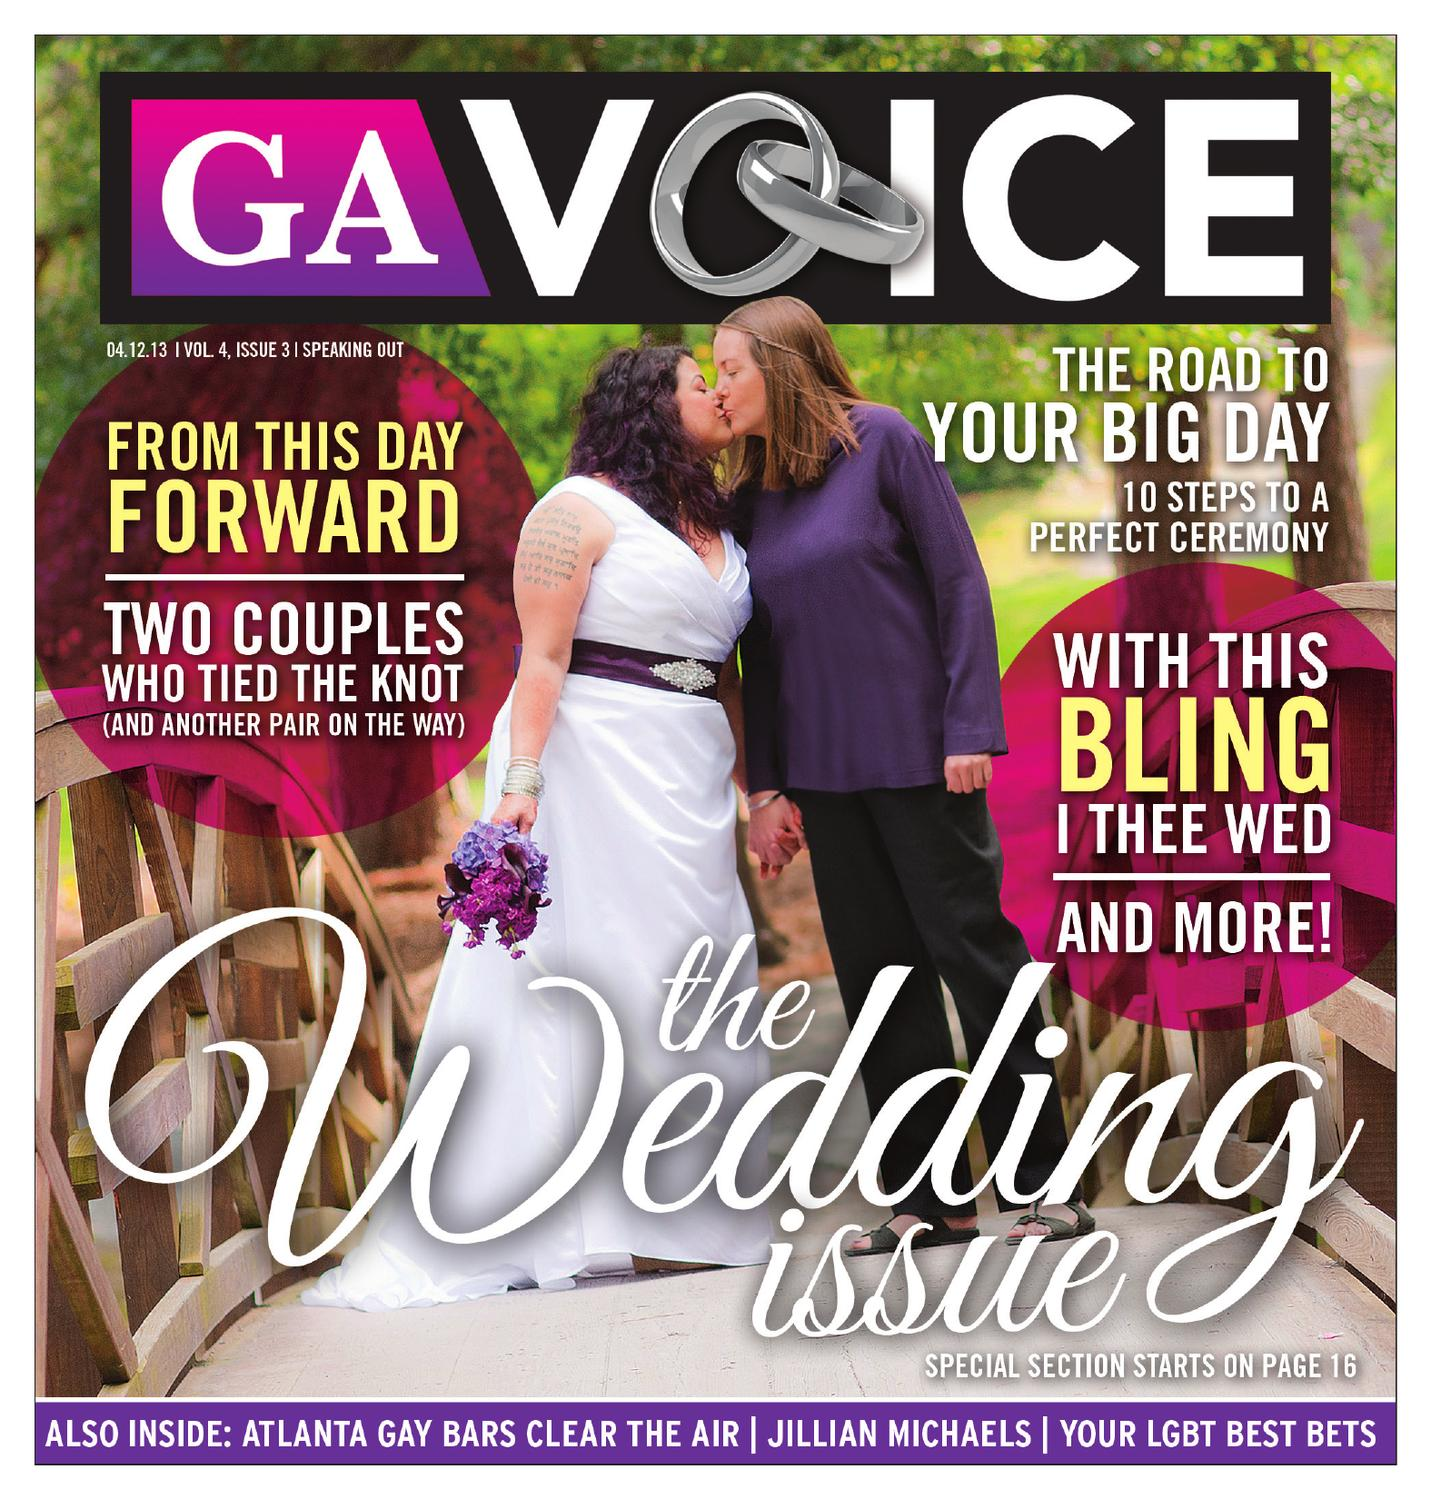 The Georgia Voice 4 12 13 Vol 4 Issue 3 By Georgia